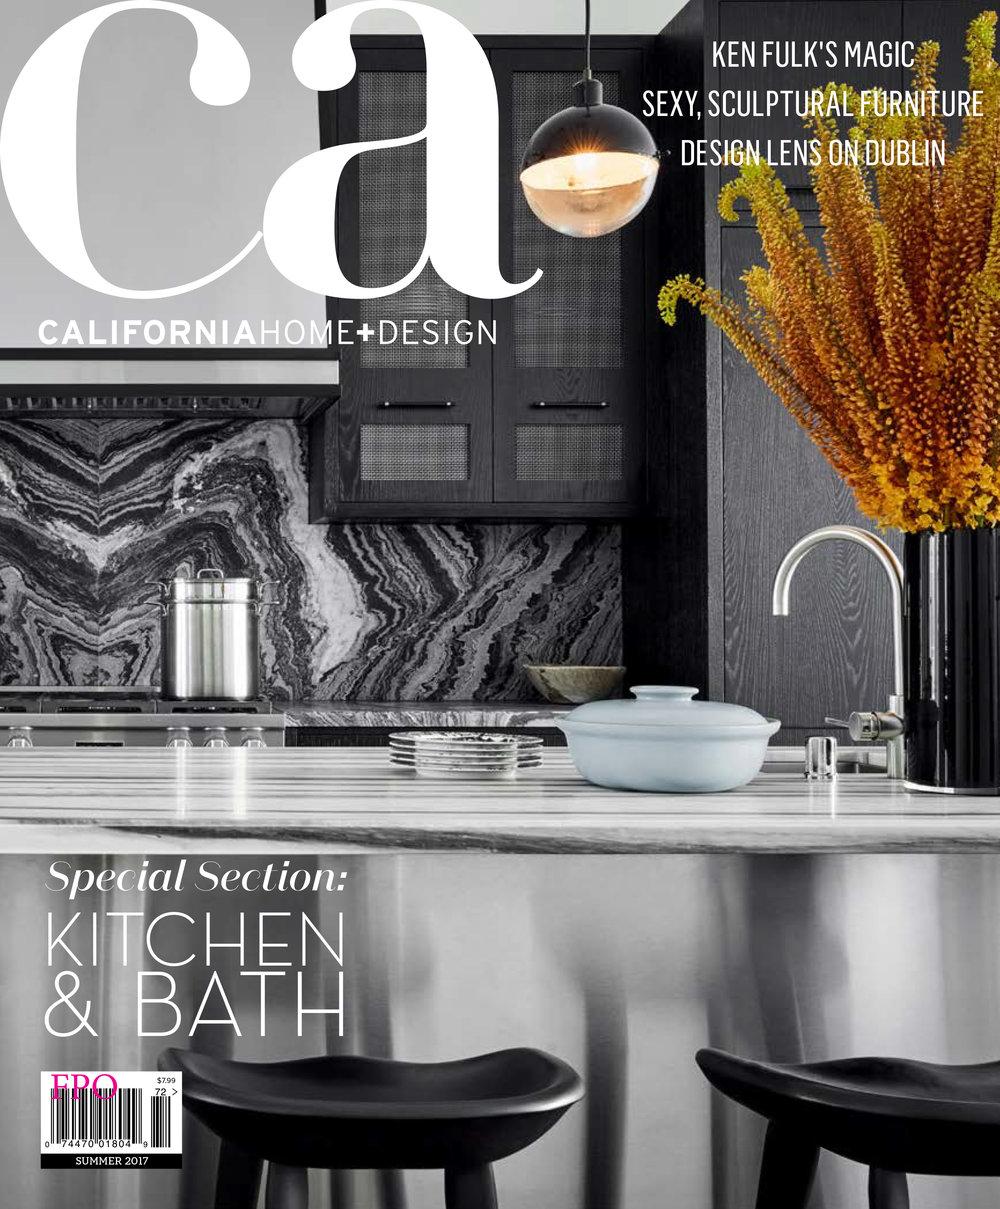 California Home + Design, Summer 2017